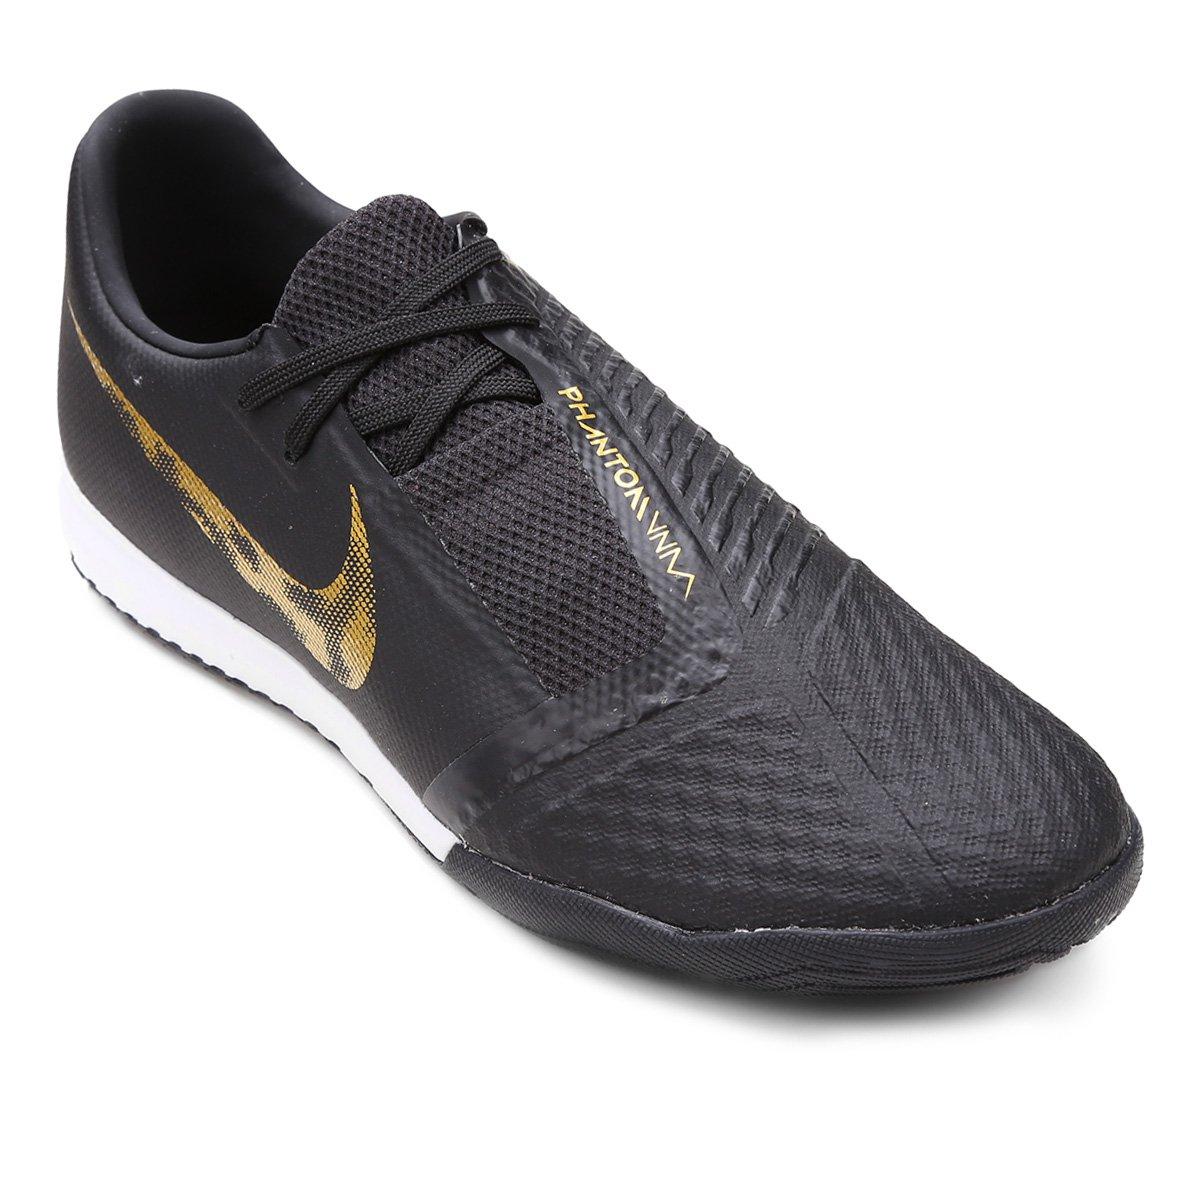 509f94a14cbaa Chuteira Futsal Nike Phantom Venom Academy IC - Preto e Dourado   Loja do  Inter